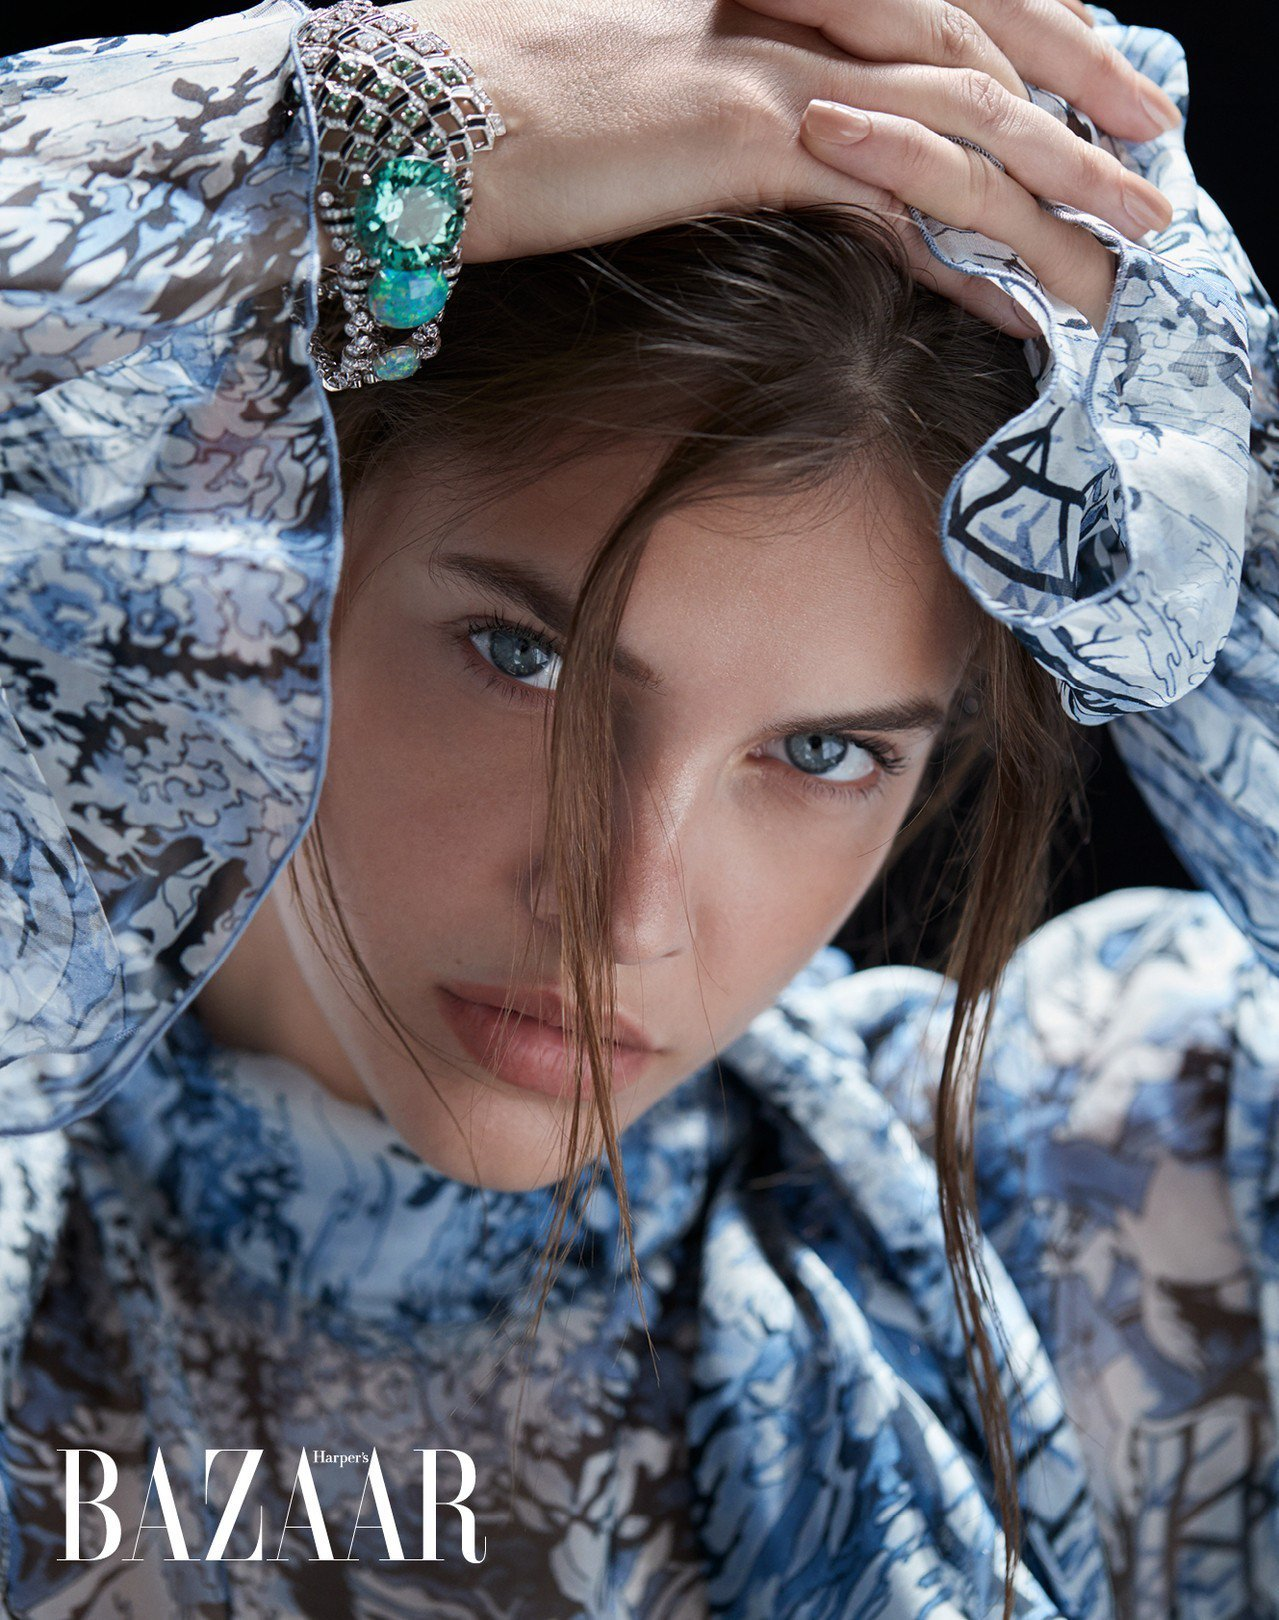 洋裝,Off White。 蛋白石及碧璽手環,Cartier。